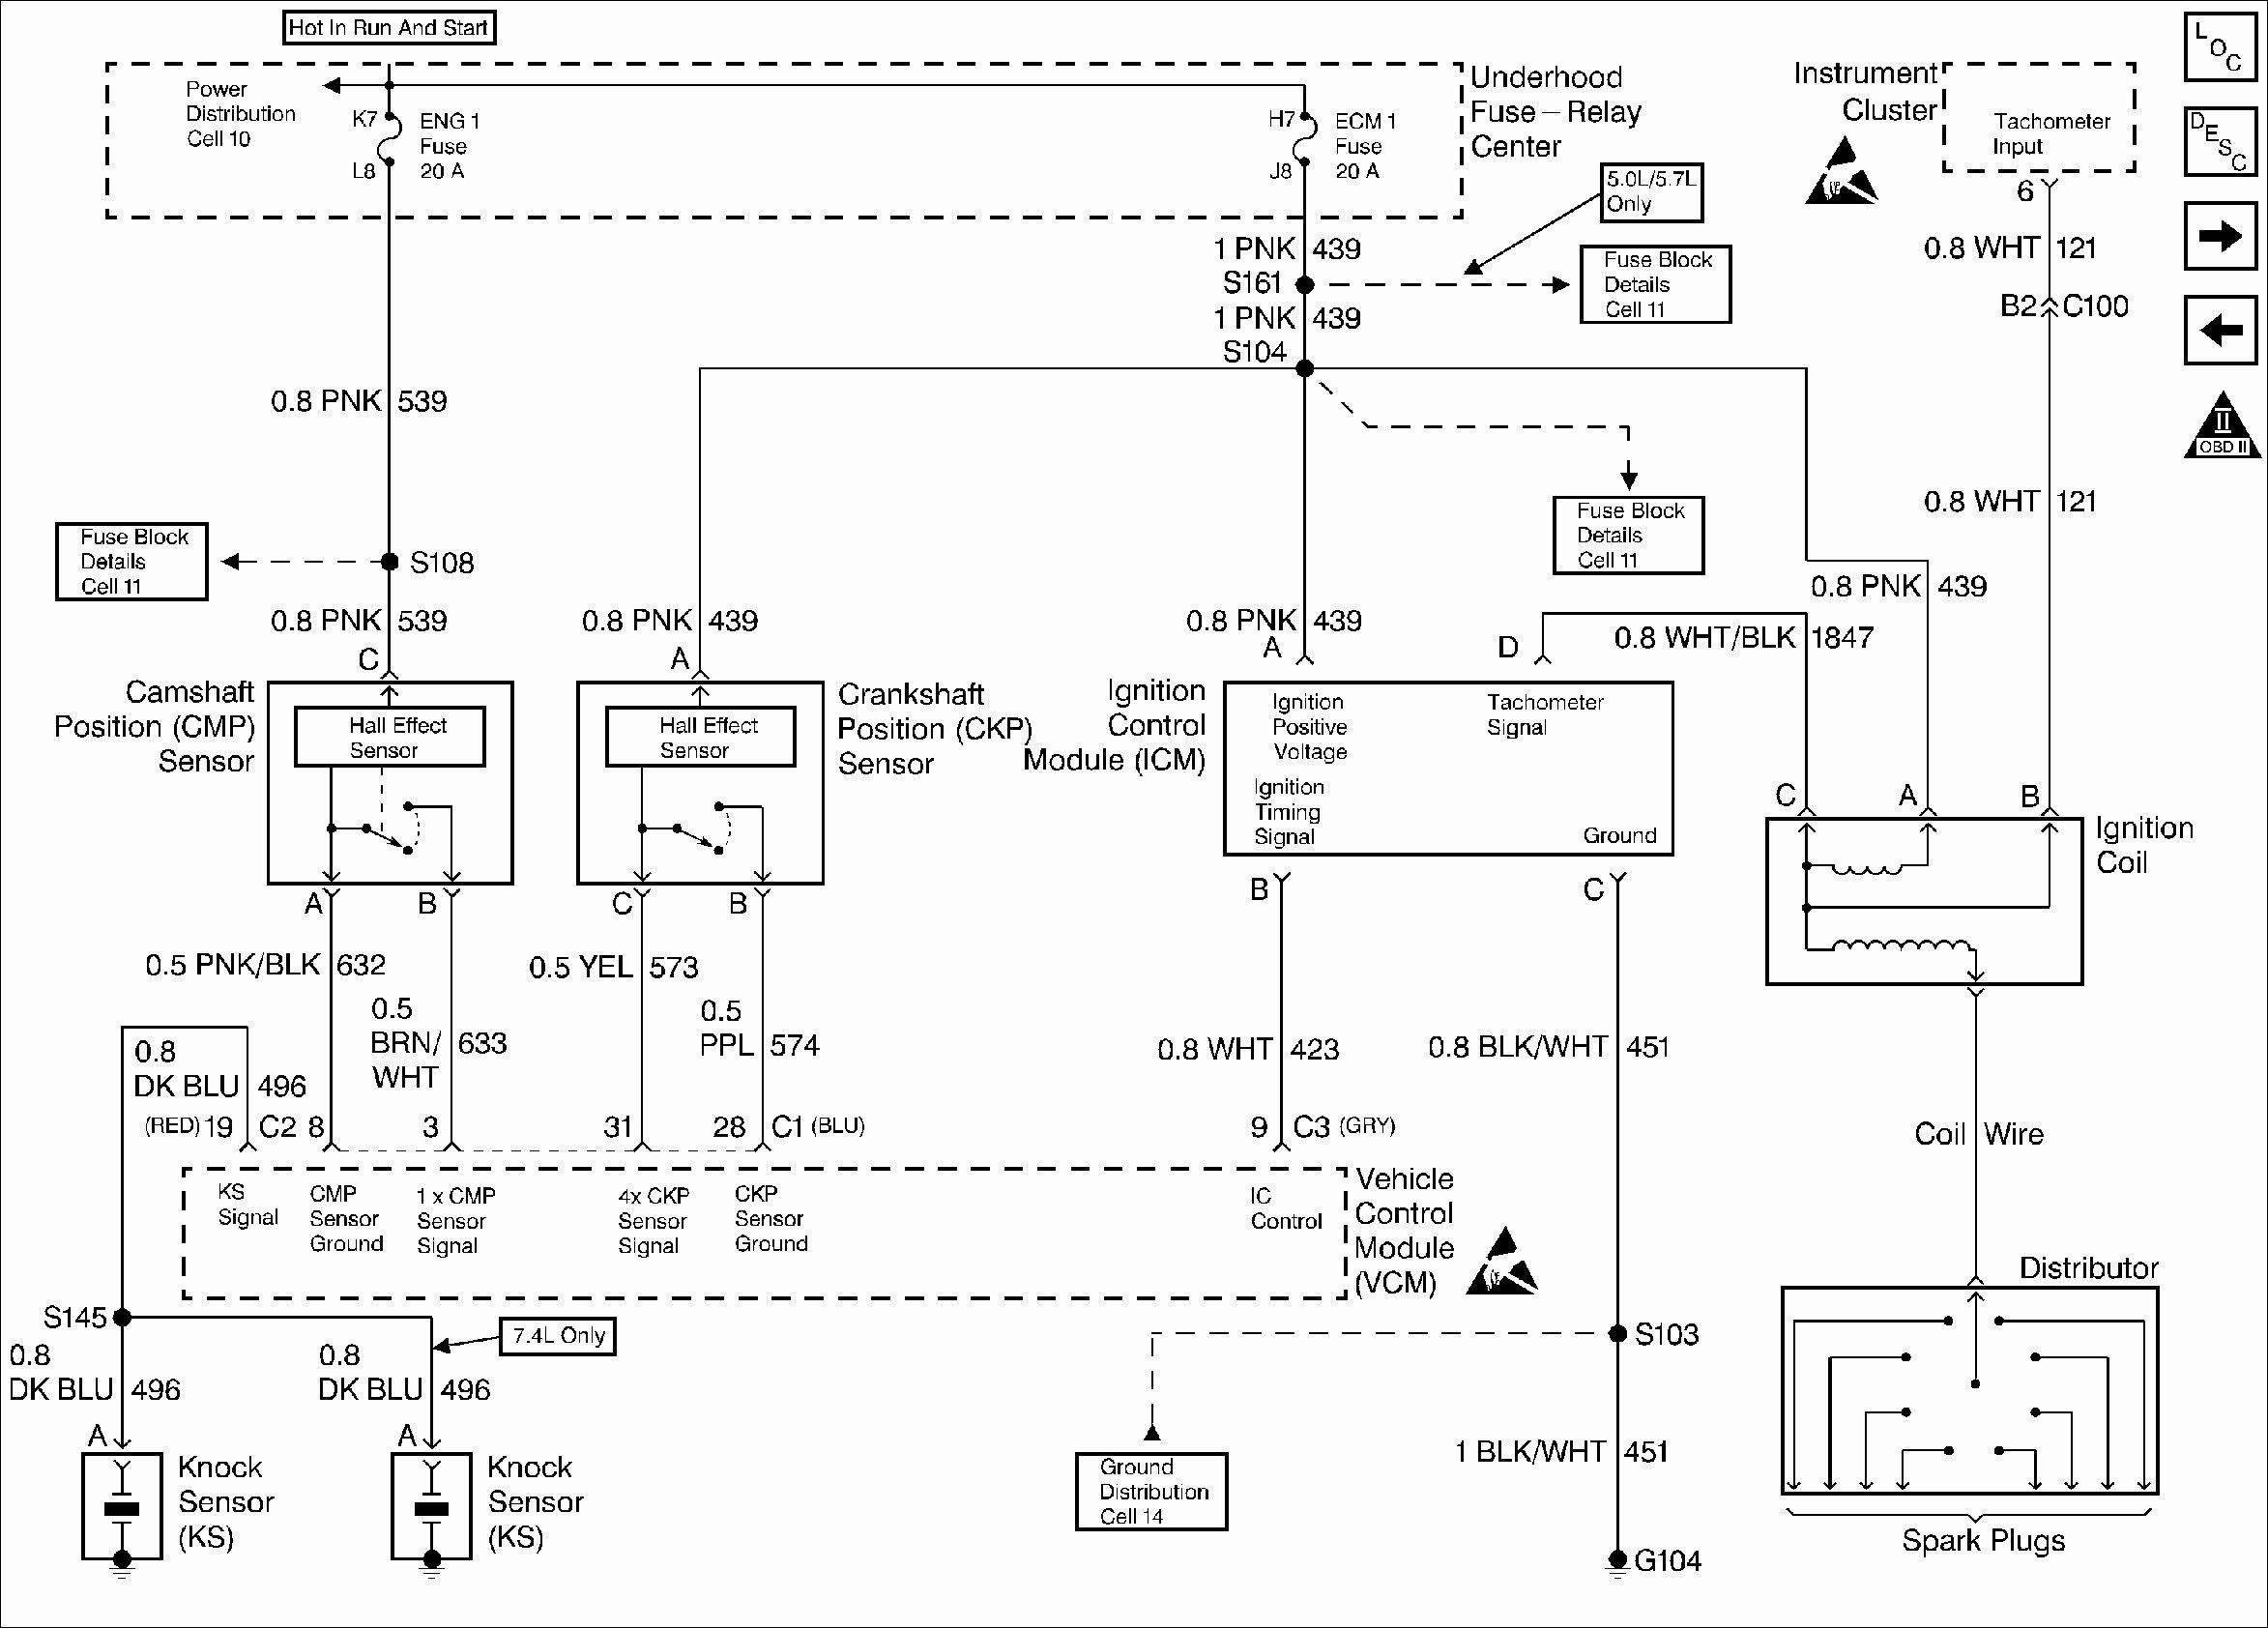 Unique Schematic For Dummies Diagram Wiringdiagram Diagramming Diagramm Visuals Visualisation Graphical Diagram Smart Wiring Wire